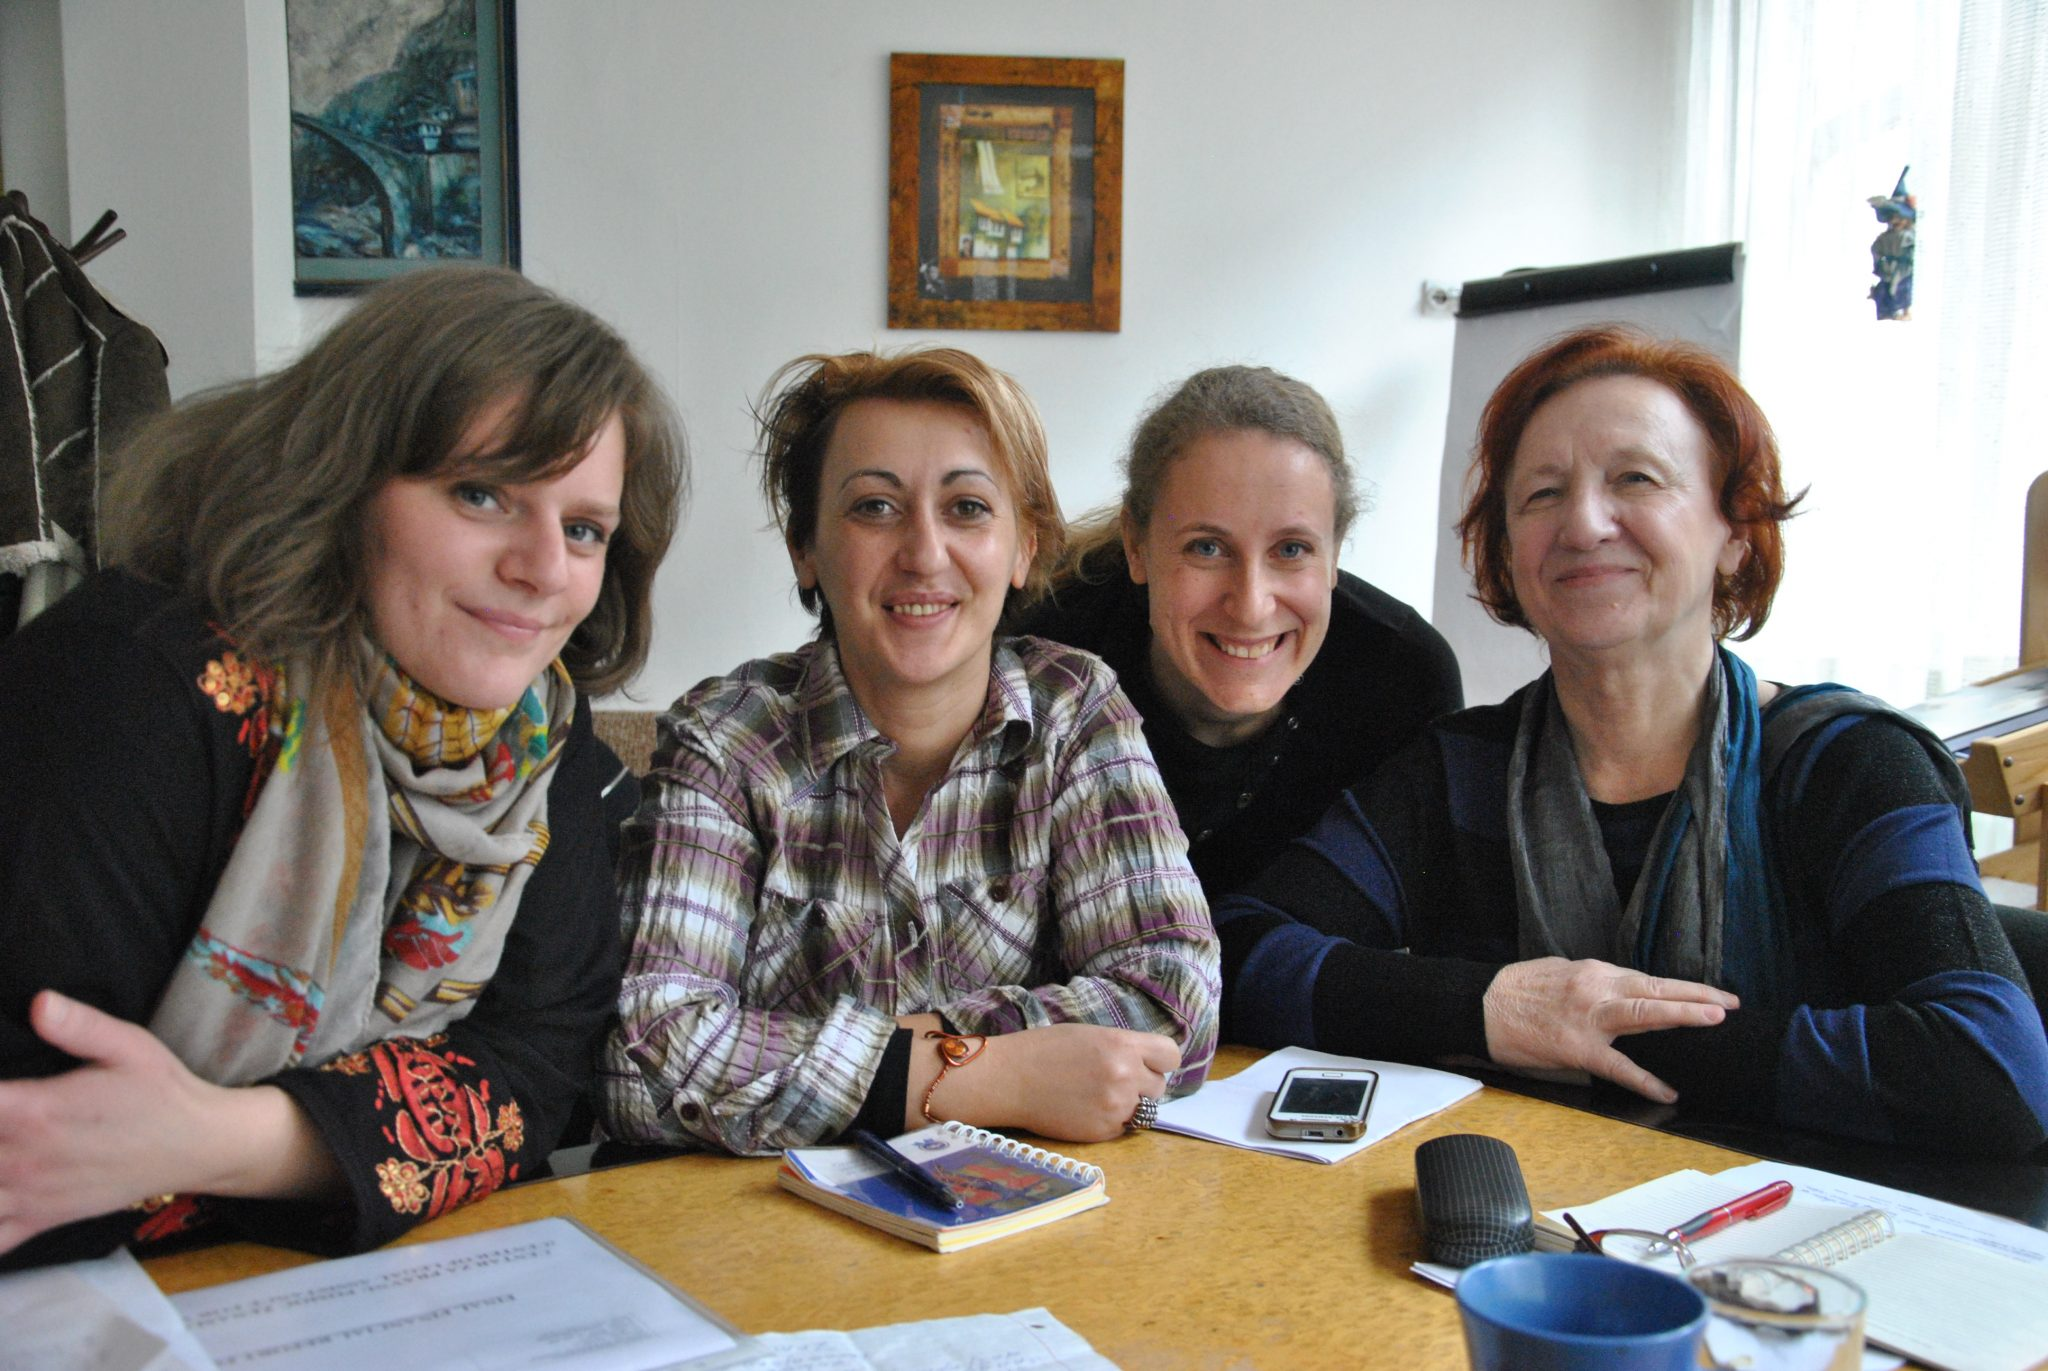 Bosnian women's rights activists preparing for an equality demonstration on 8 March, International Women's Day. Photo: Johanna Arkåsen / Kvinna till Kvinna